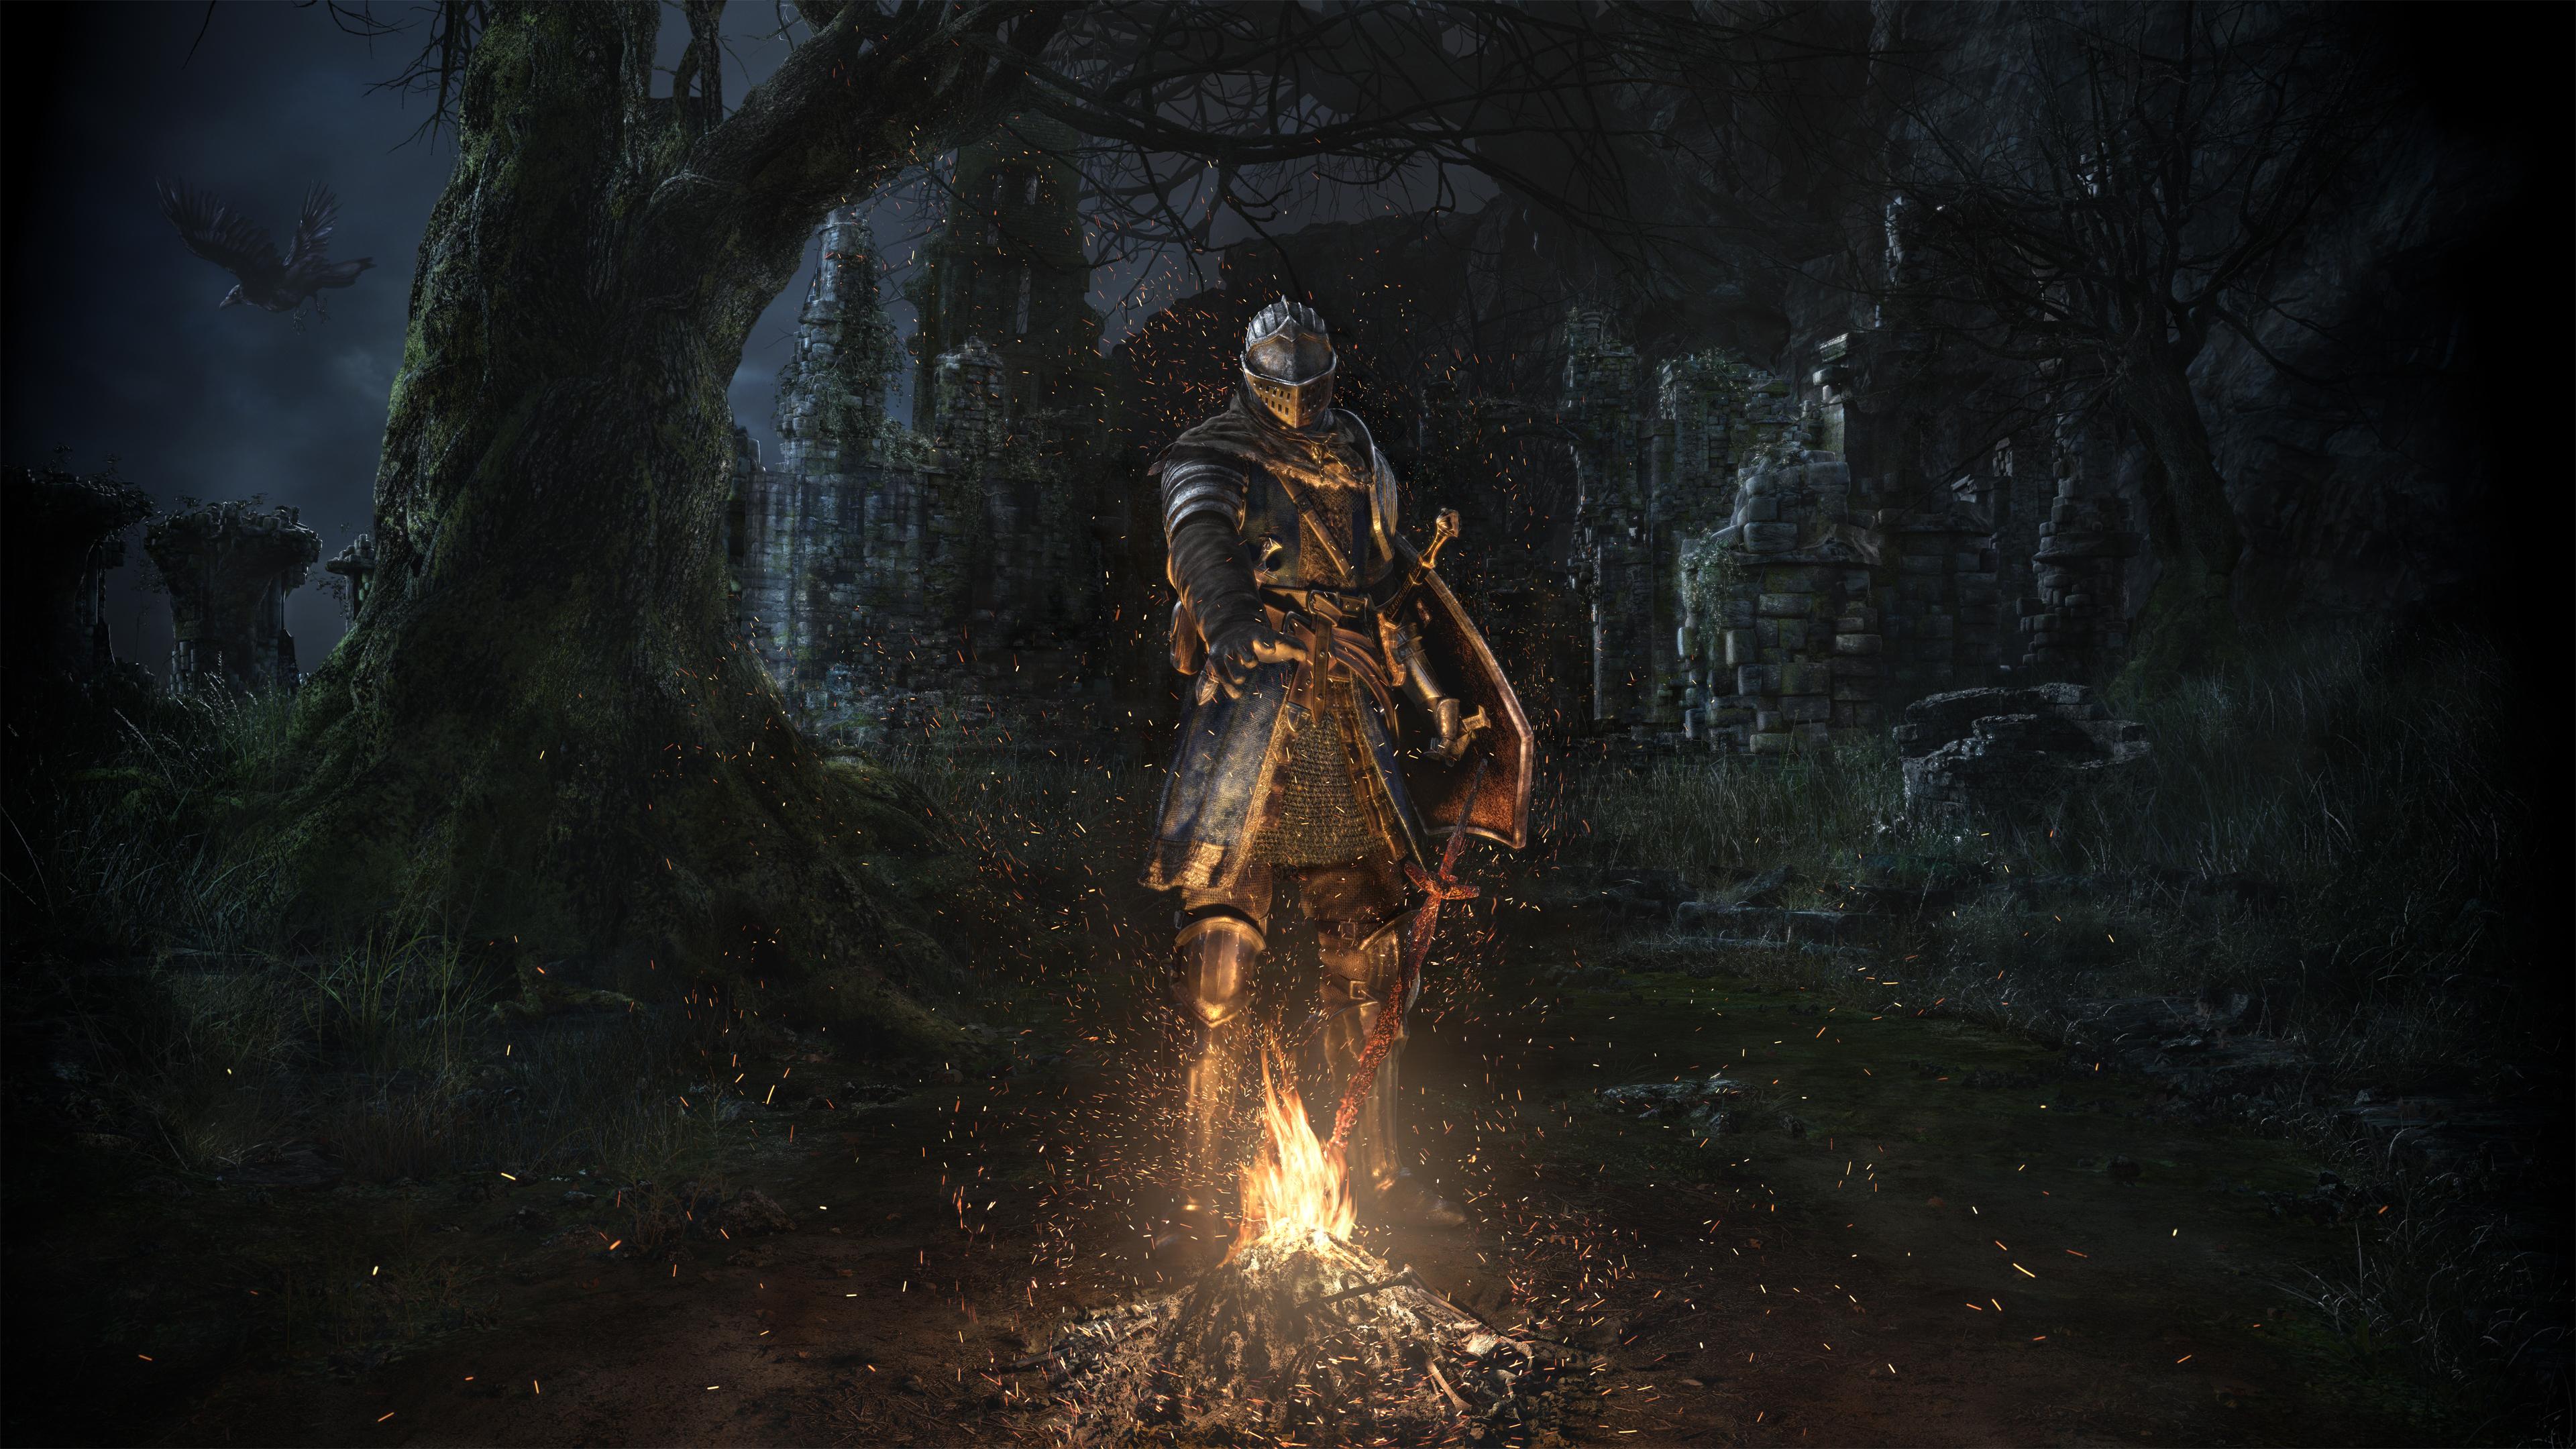 dark souls remastered key art 4k hd games 4k wallpapers images